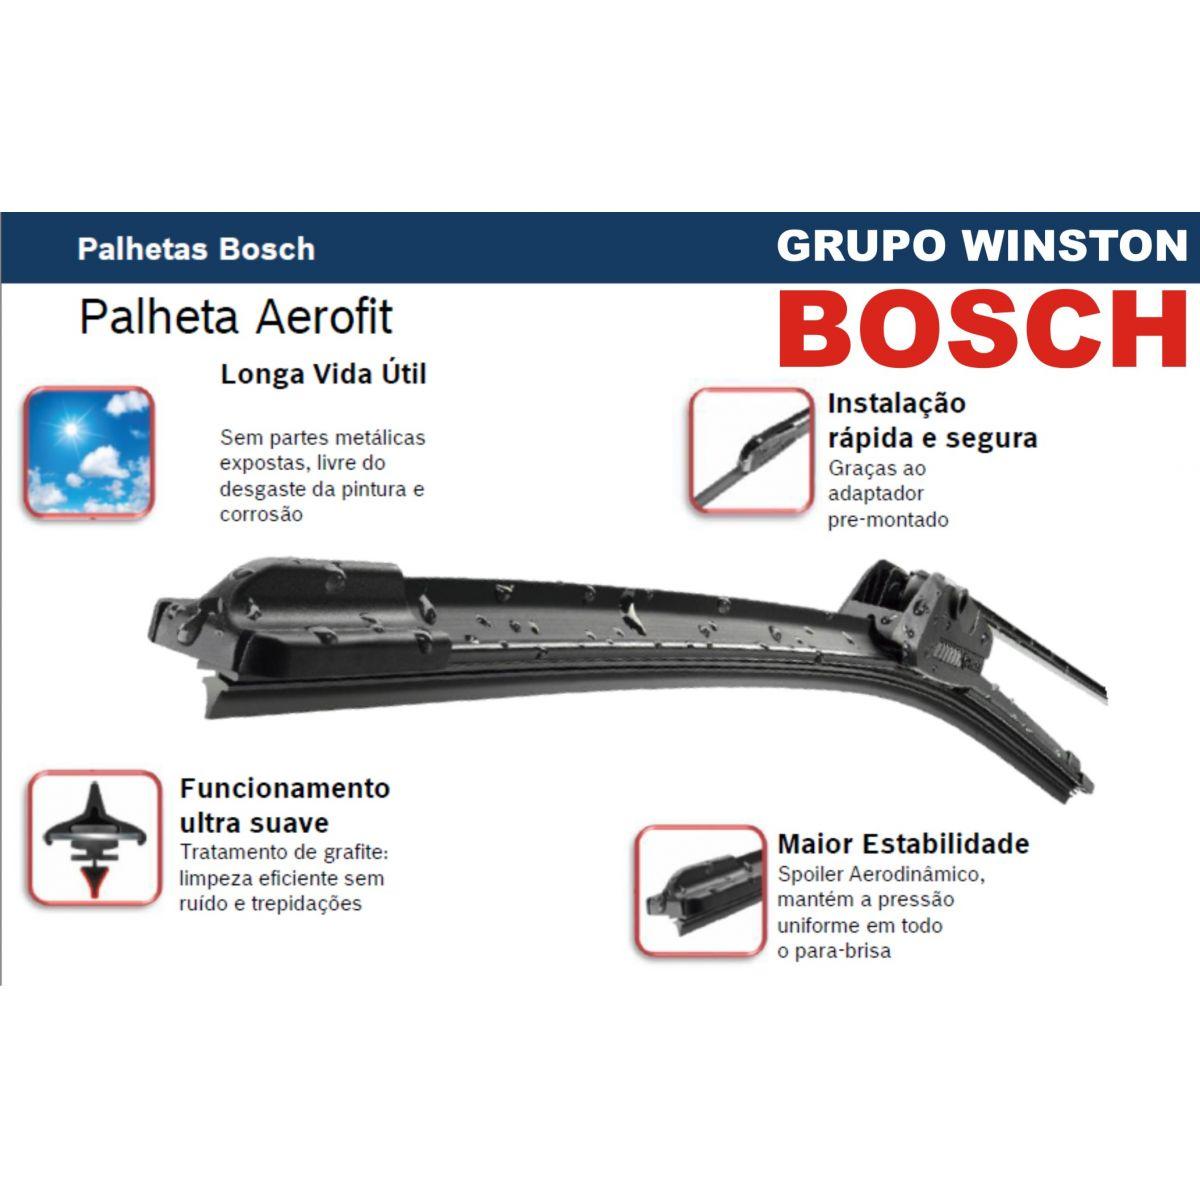 Palheta Bosch Aerofit Limpador de para brisa Bosch CHRYSLER PT Cruiser